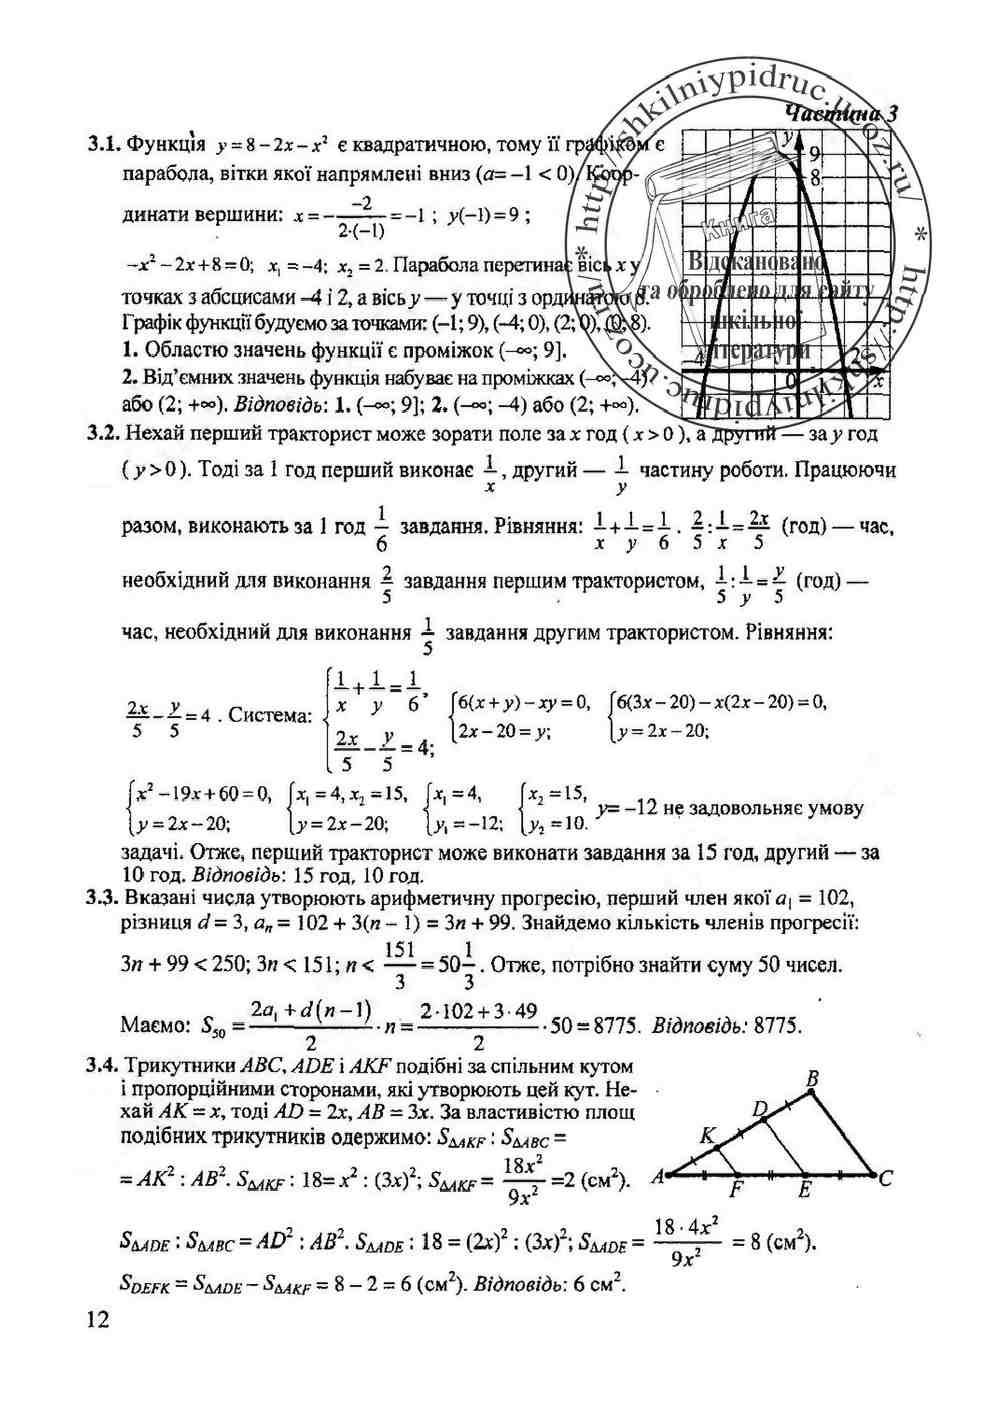 дпа с математики 9 клас решебник